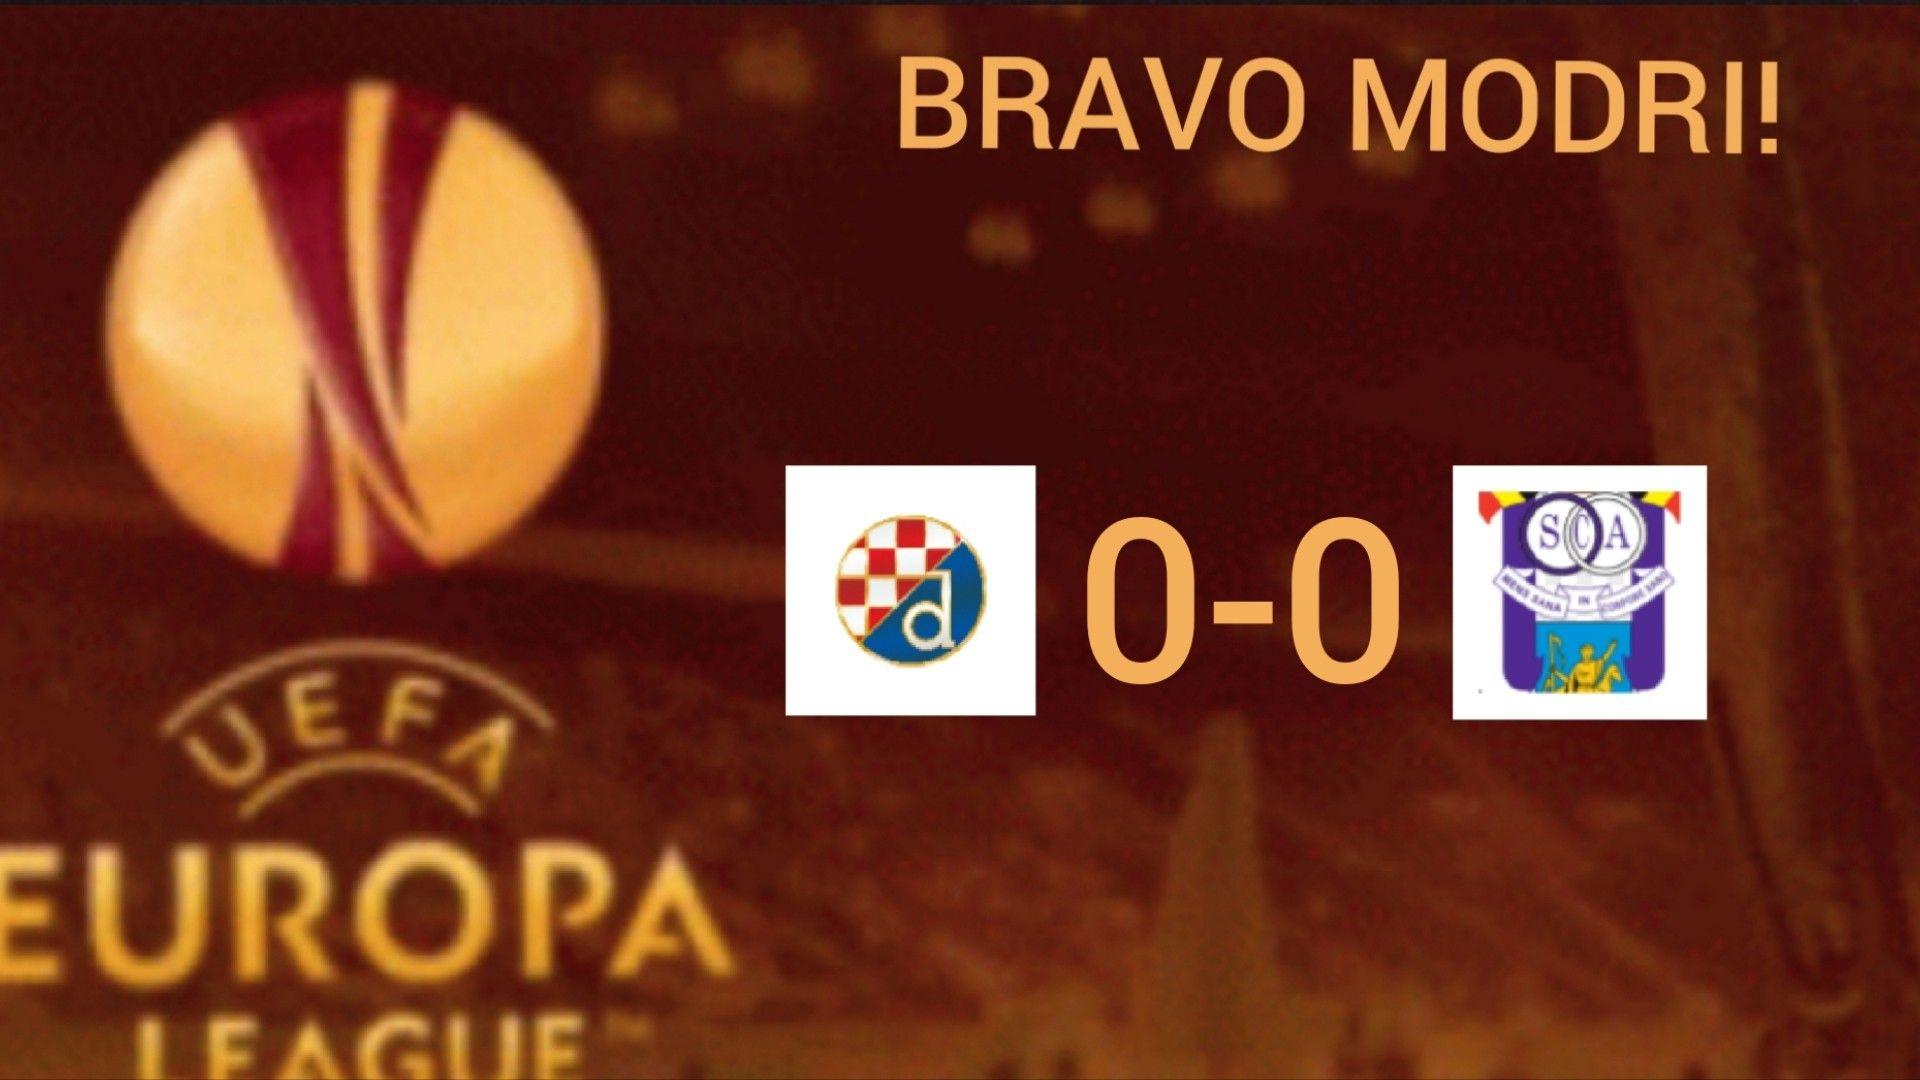 Company Logo Image By Croatia Football News On Dinamo Zagreb Europa League 2018 2019 Tech Company Logos Europa League